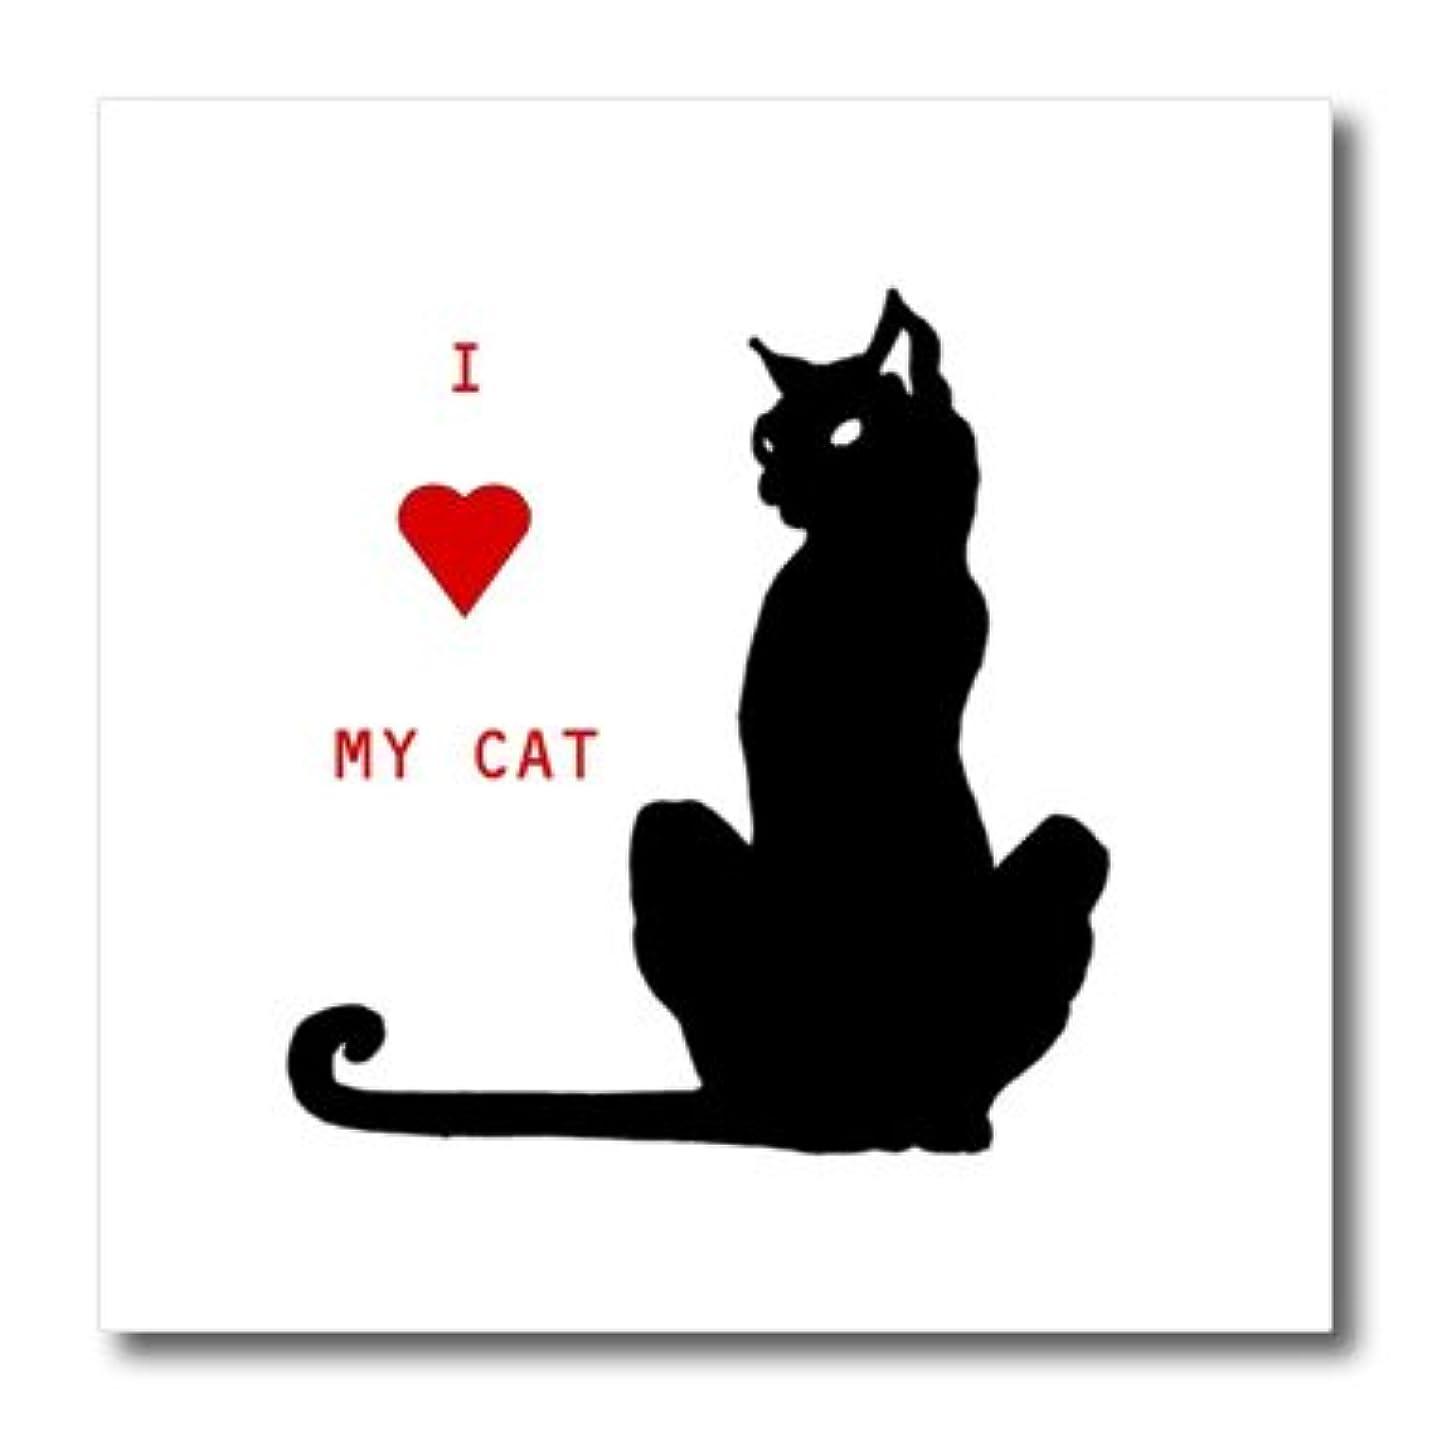 3dRose I Love My Cat-Iron on Heat Transfer, 8 by 8